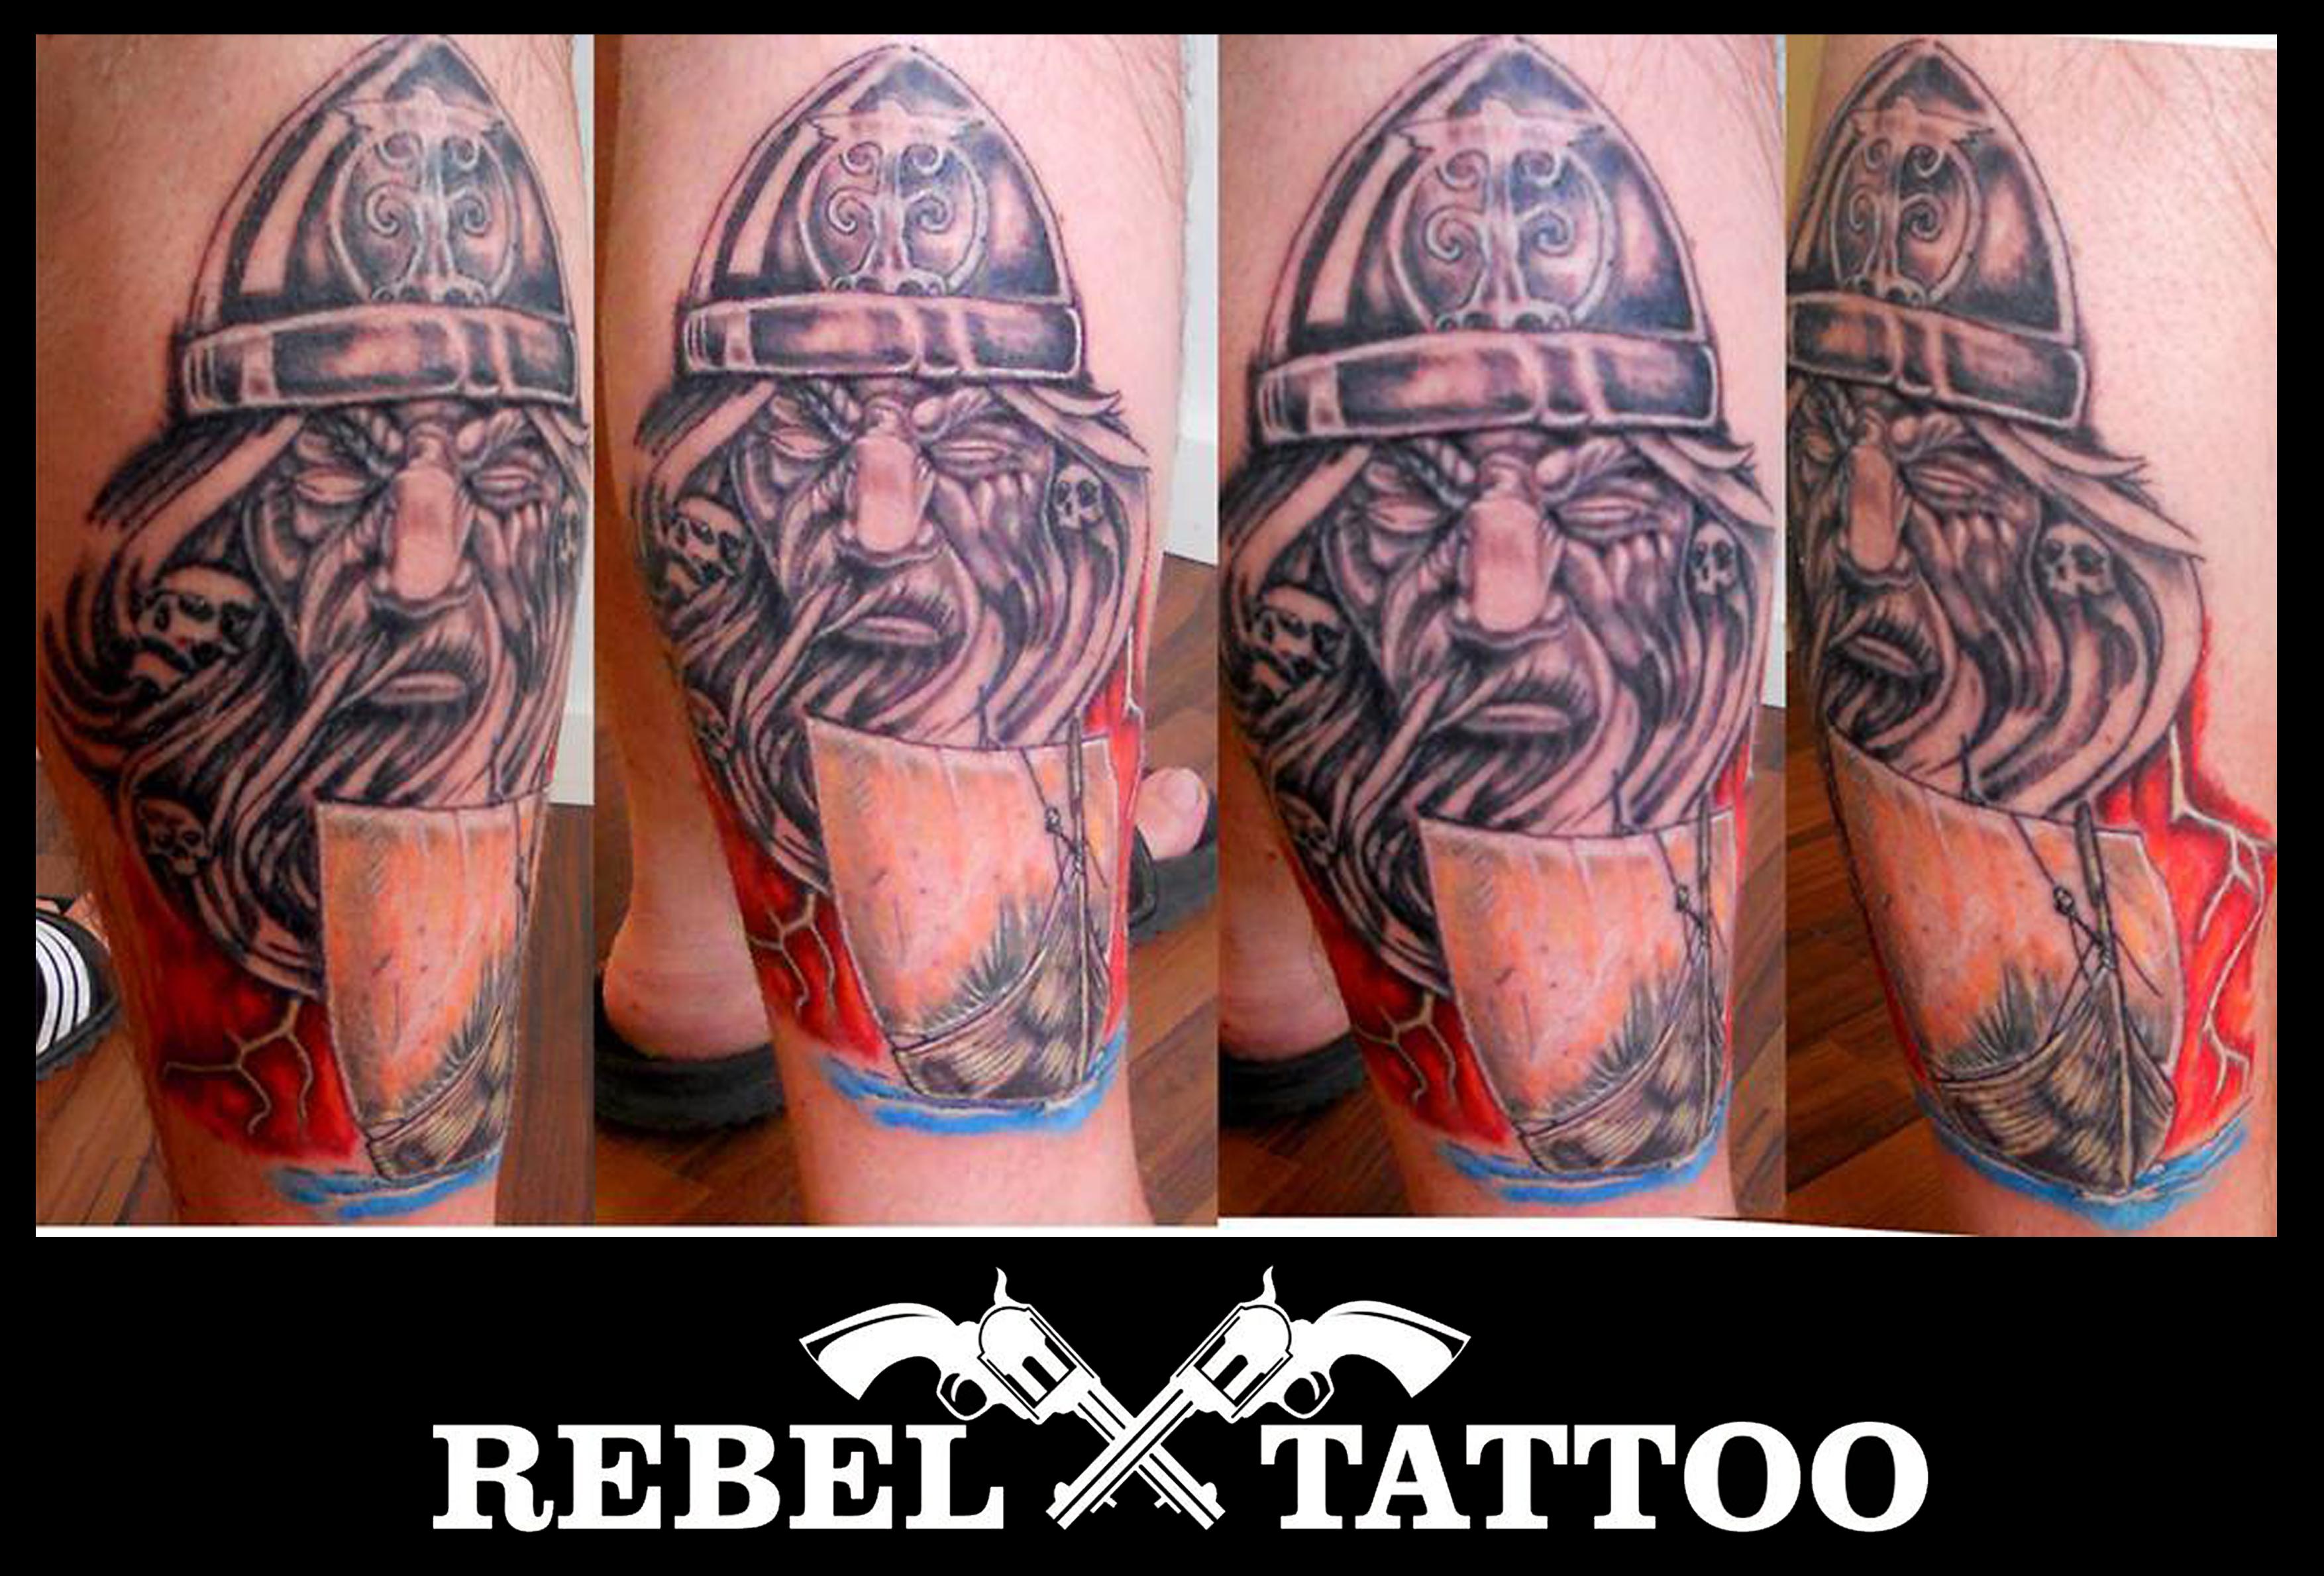 Tattoo i piercing Rebel